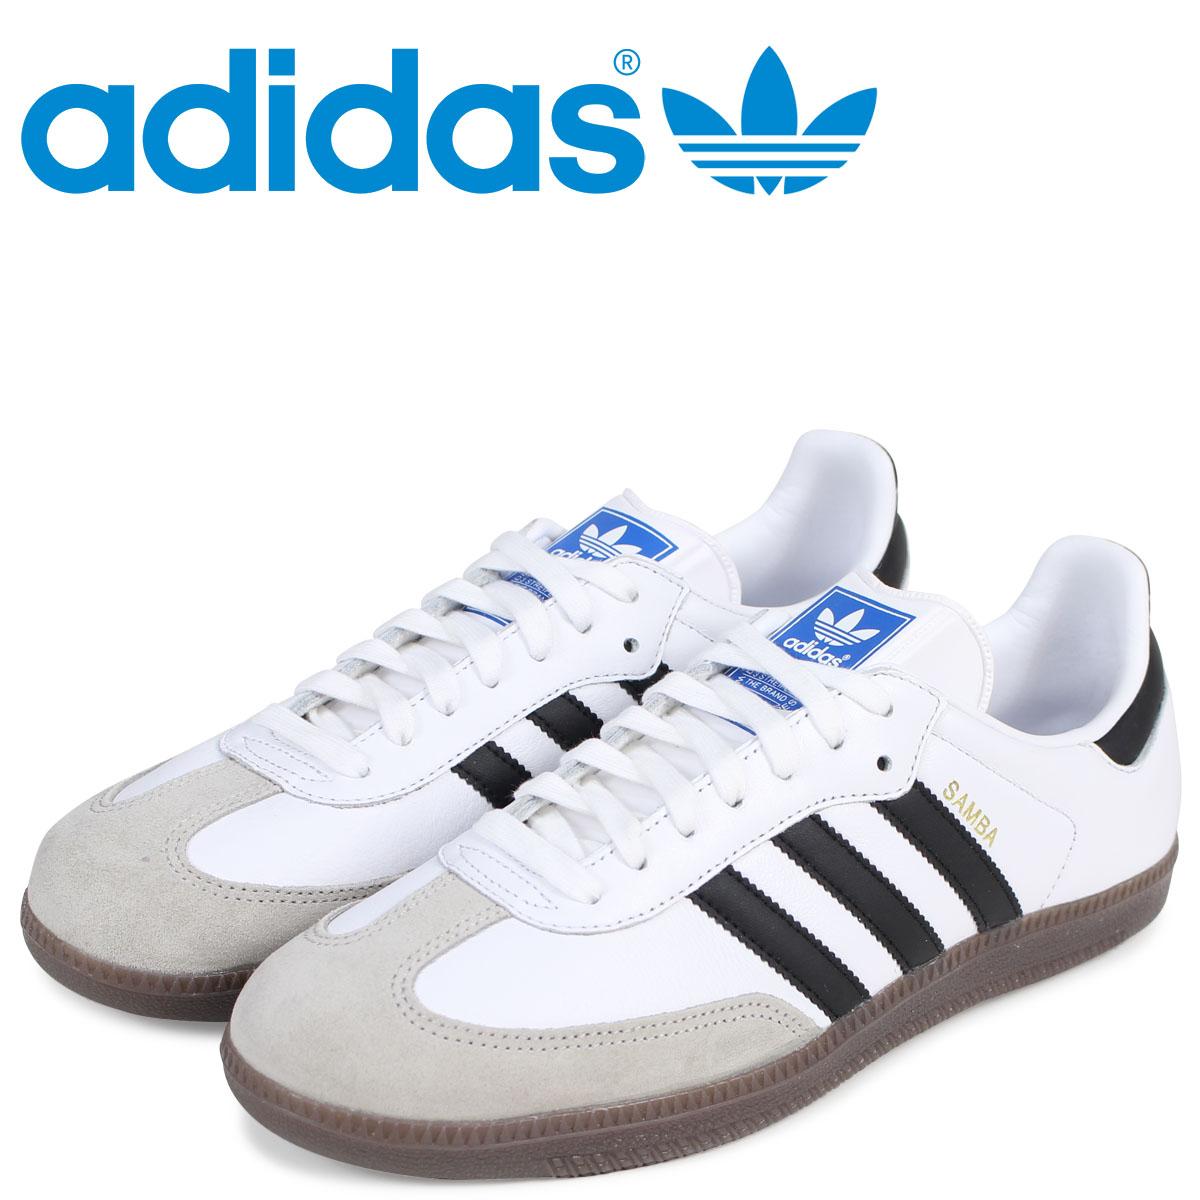 adidas Originals サンバ アディダス スニーカー SAMBA メンズ BZ0057 ホワイト